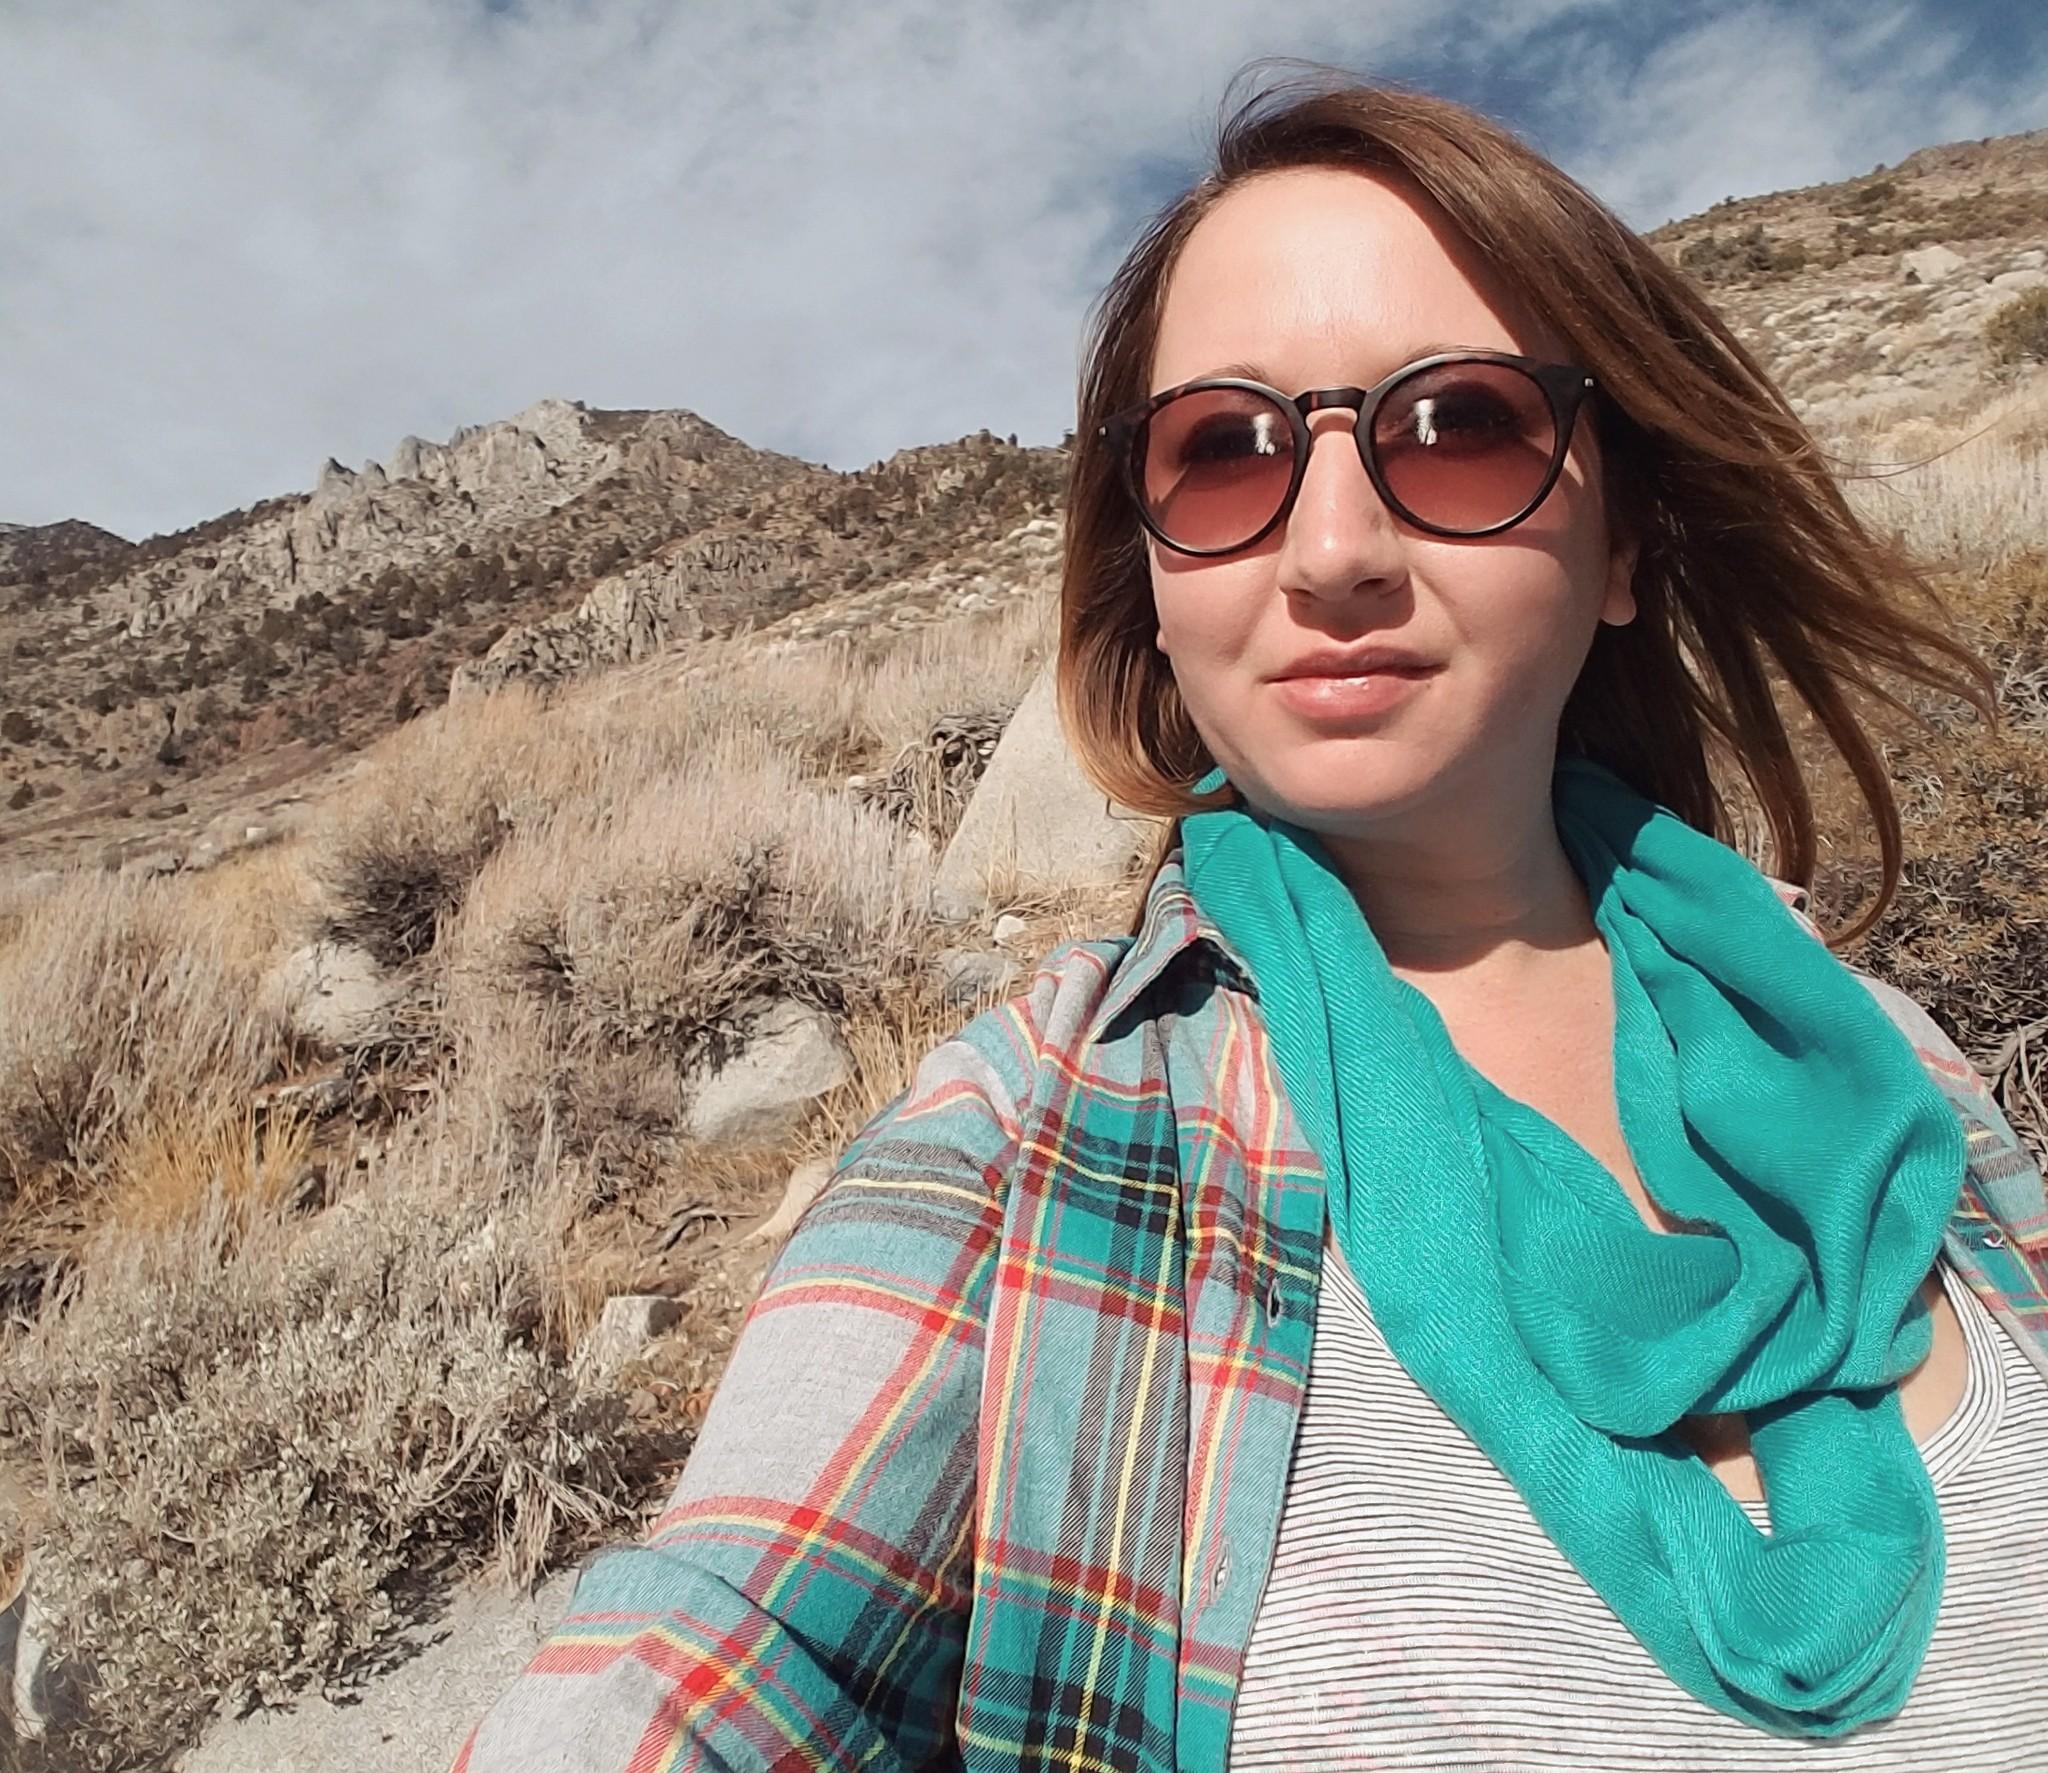 Convict-lake-hike-selfie